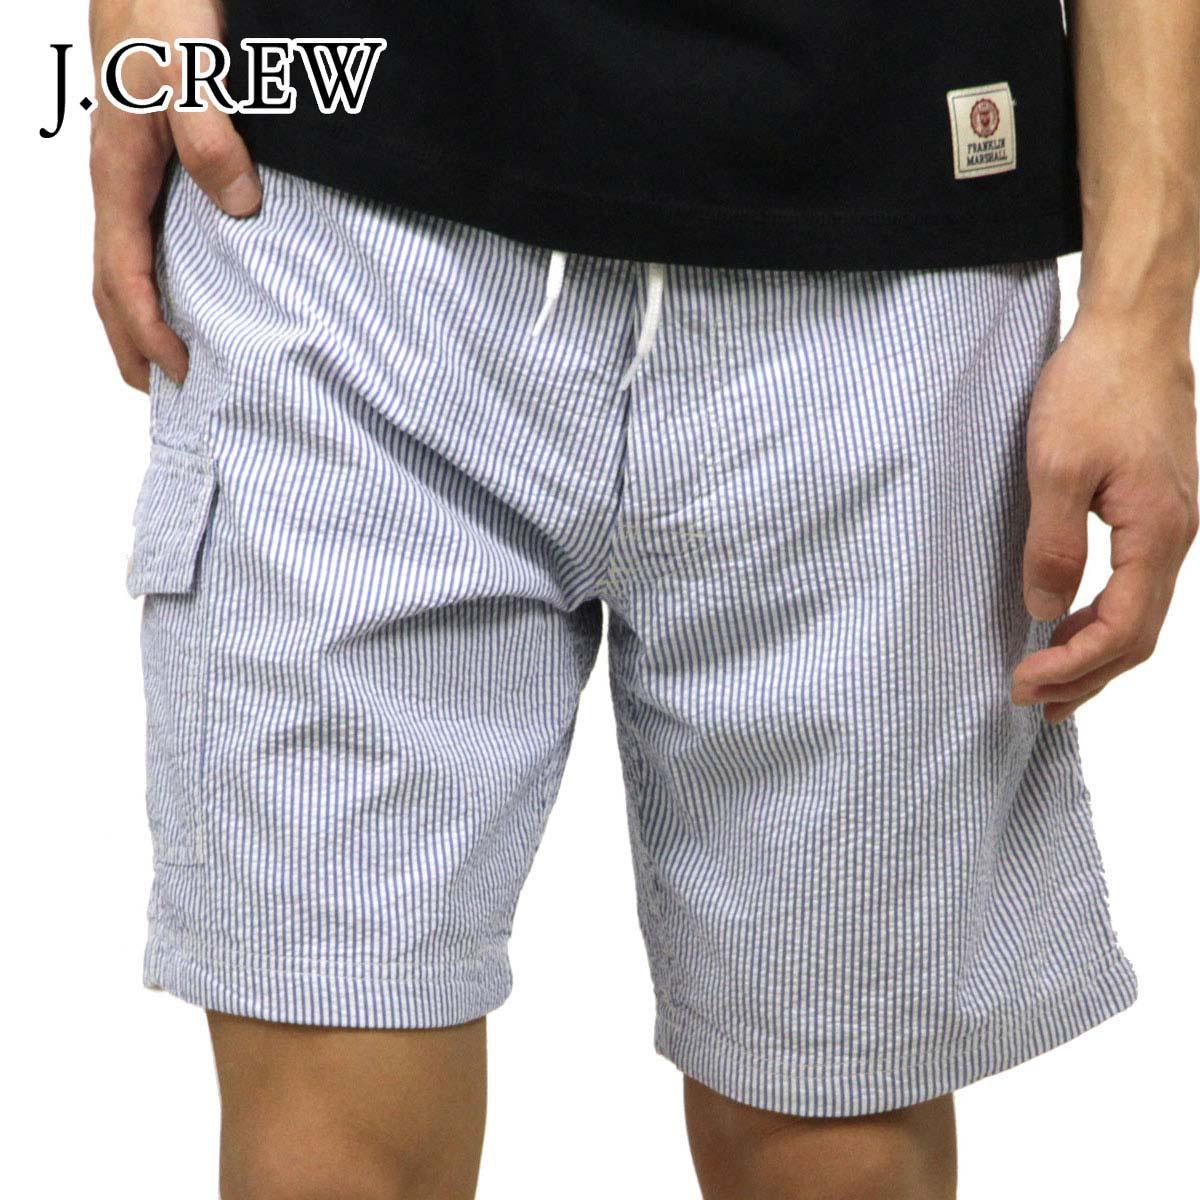 b6a8c65412 J. Crew J.CREW regular article men swimming underwear swimsuit 9